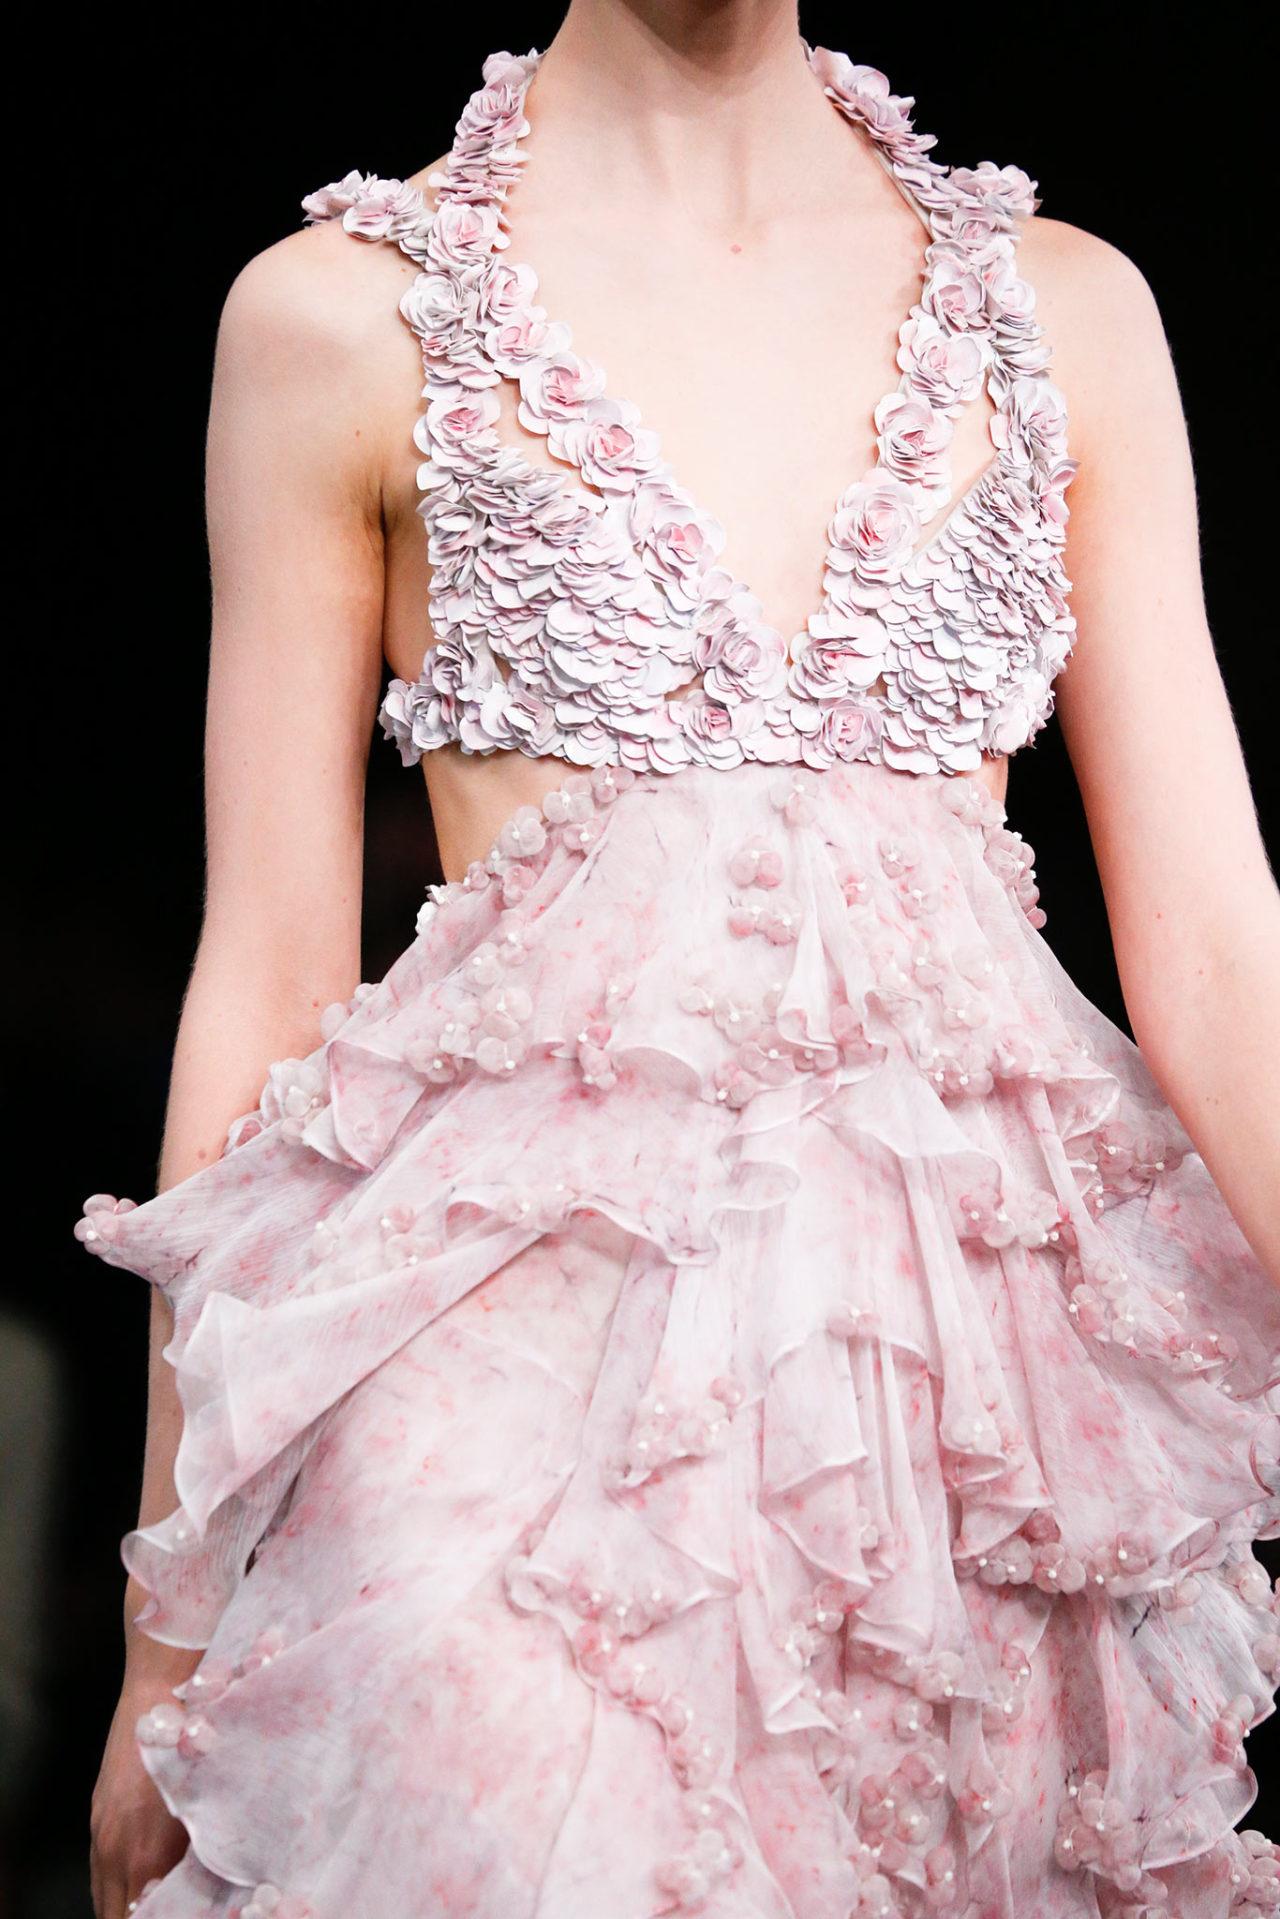 Najljepše haljine - Page 21 Tumblr_ncqidjx0VZ1rvyr2no1_1280